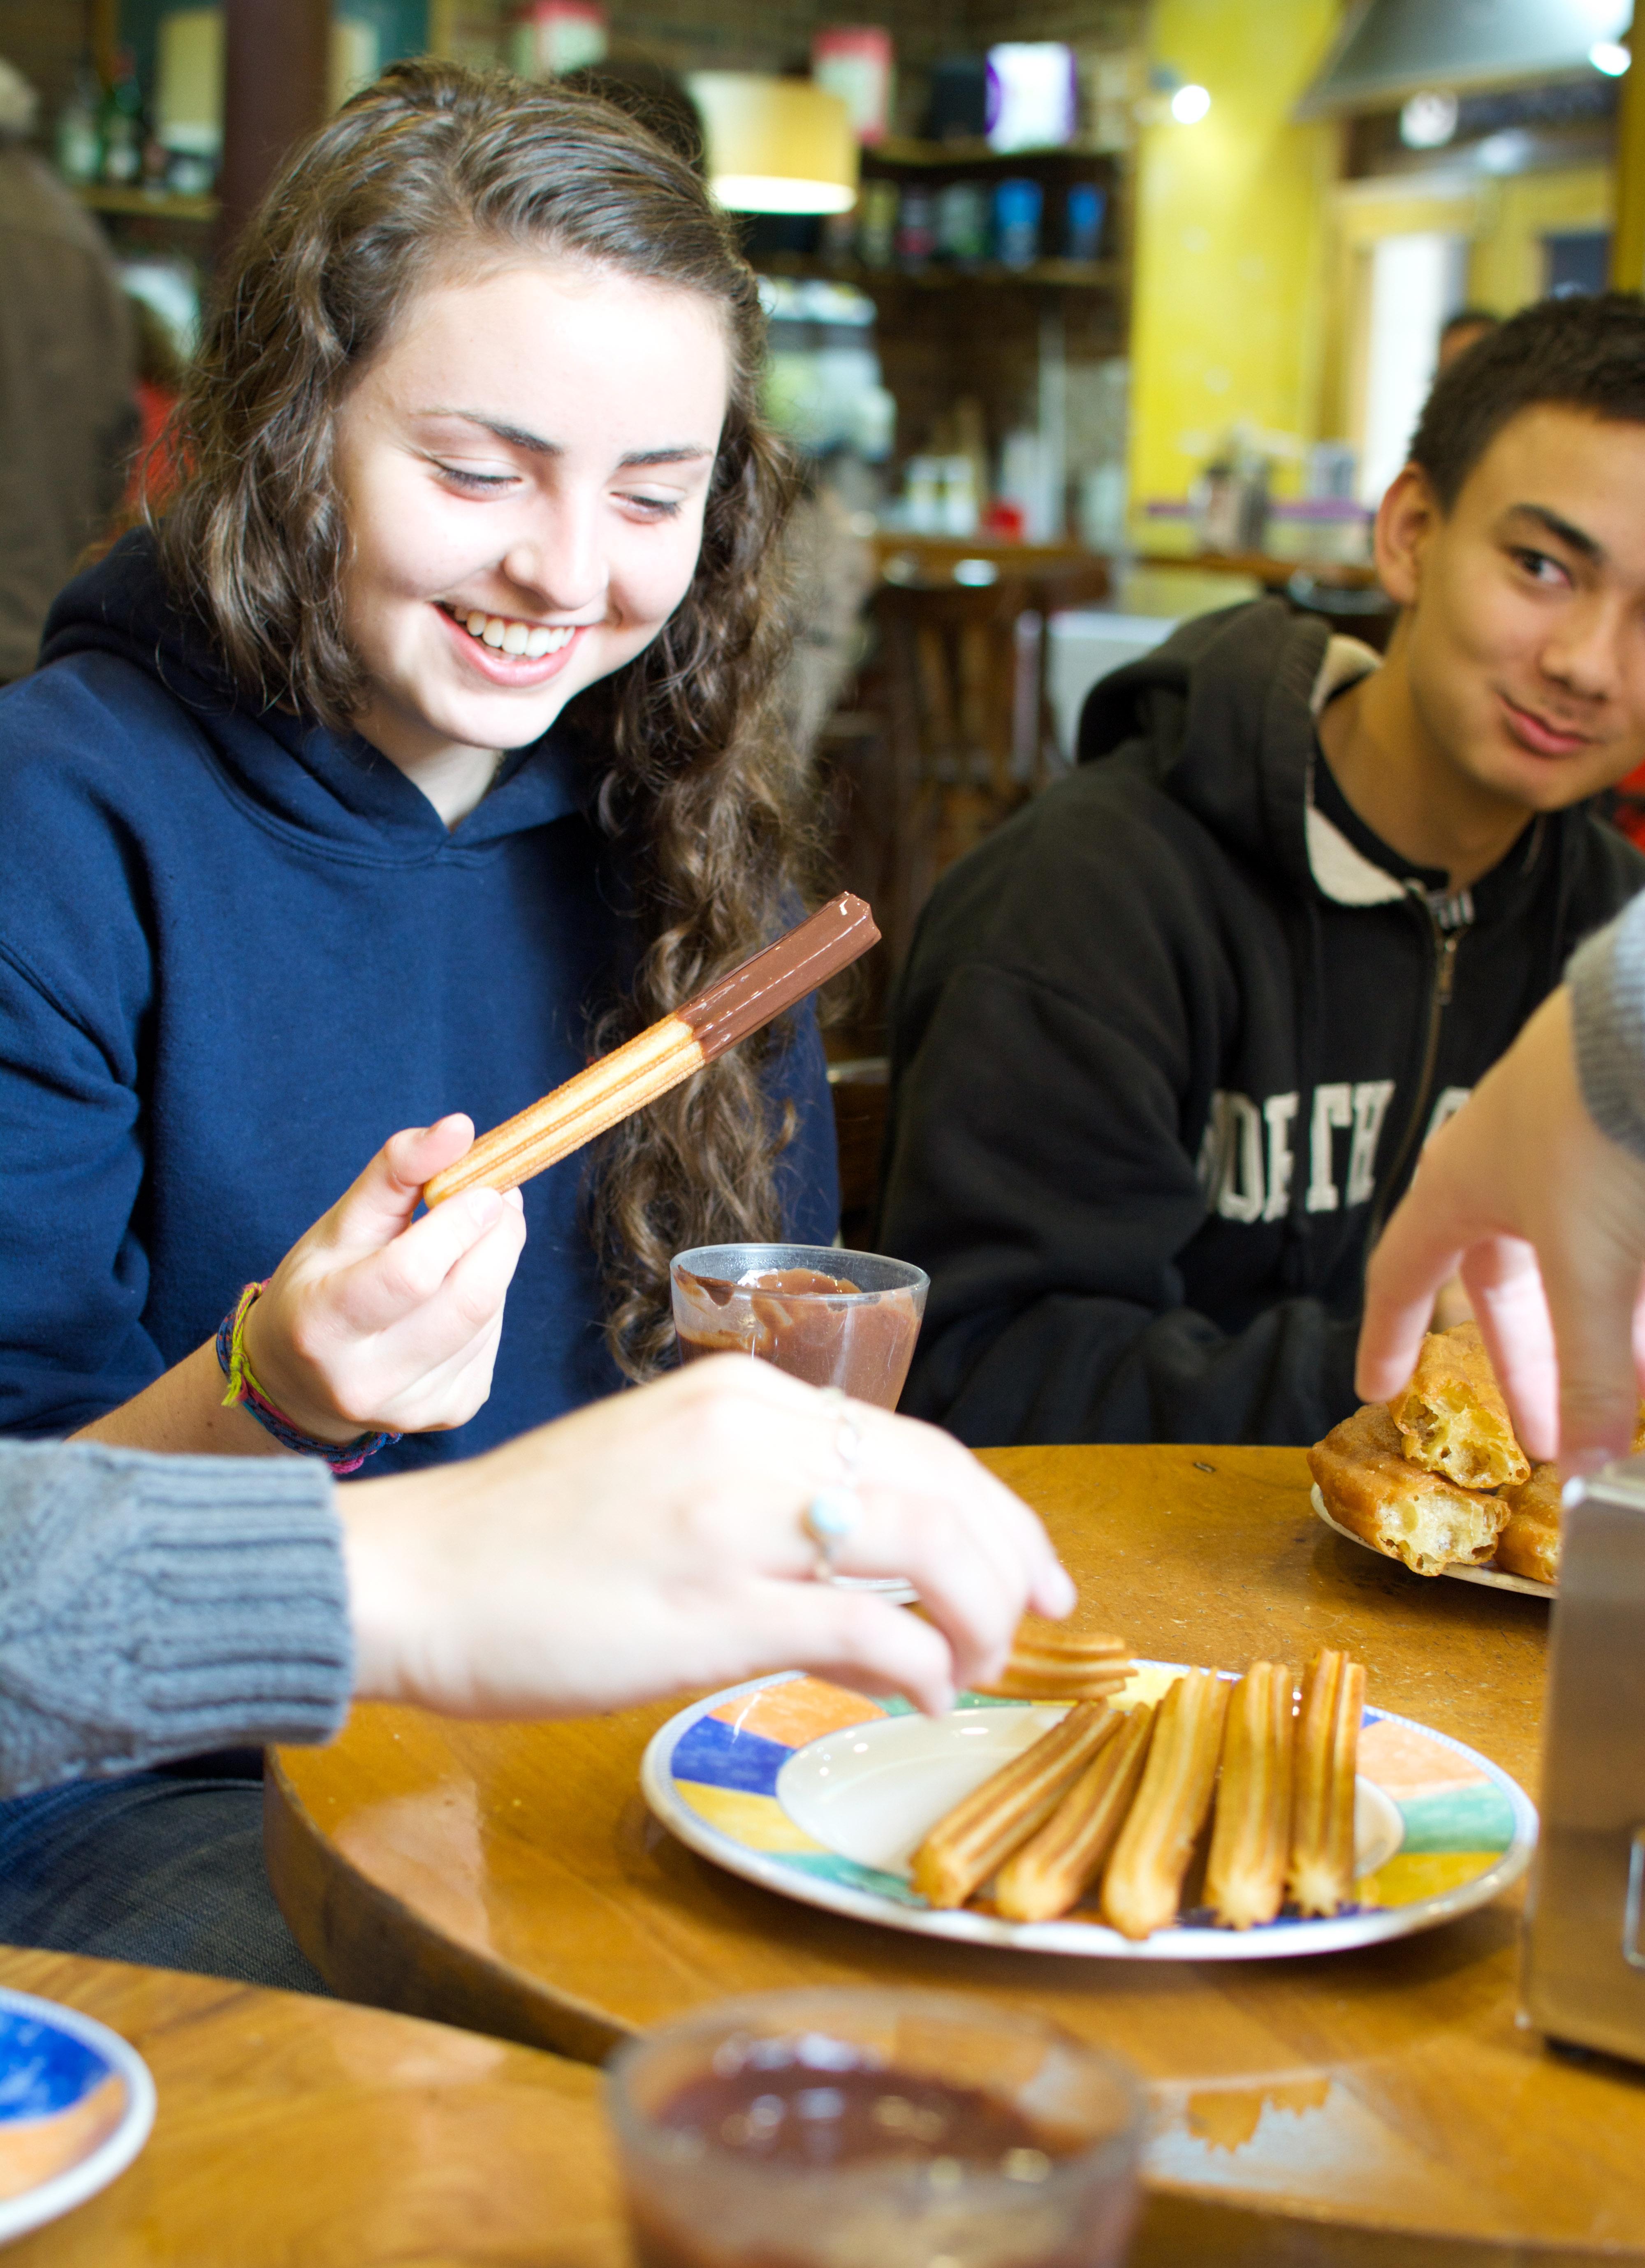 Proctor en Segovia student birthday!